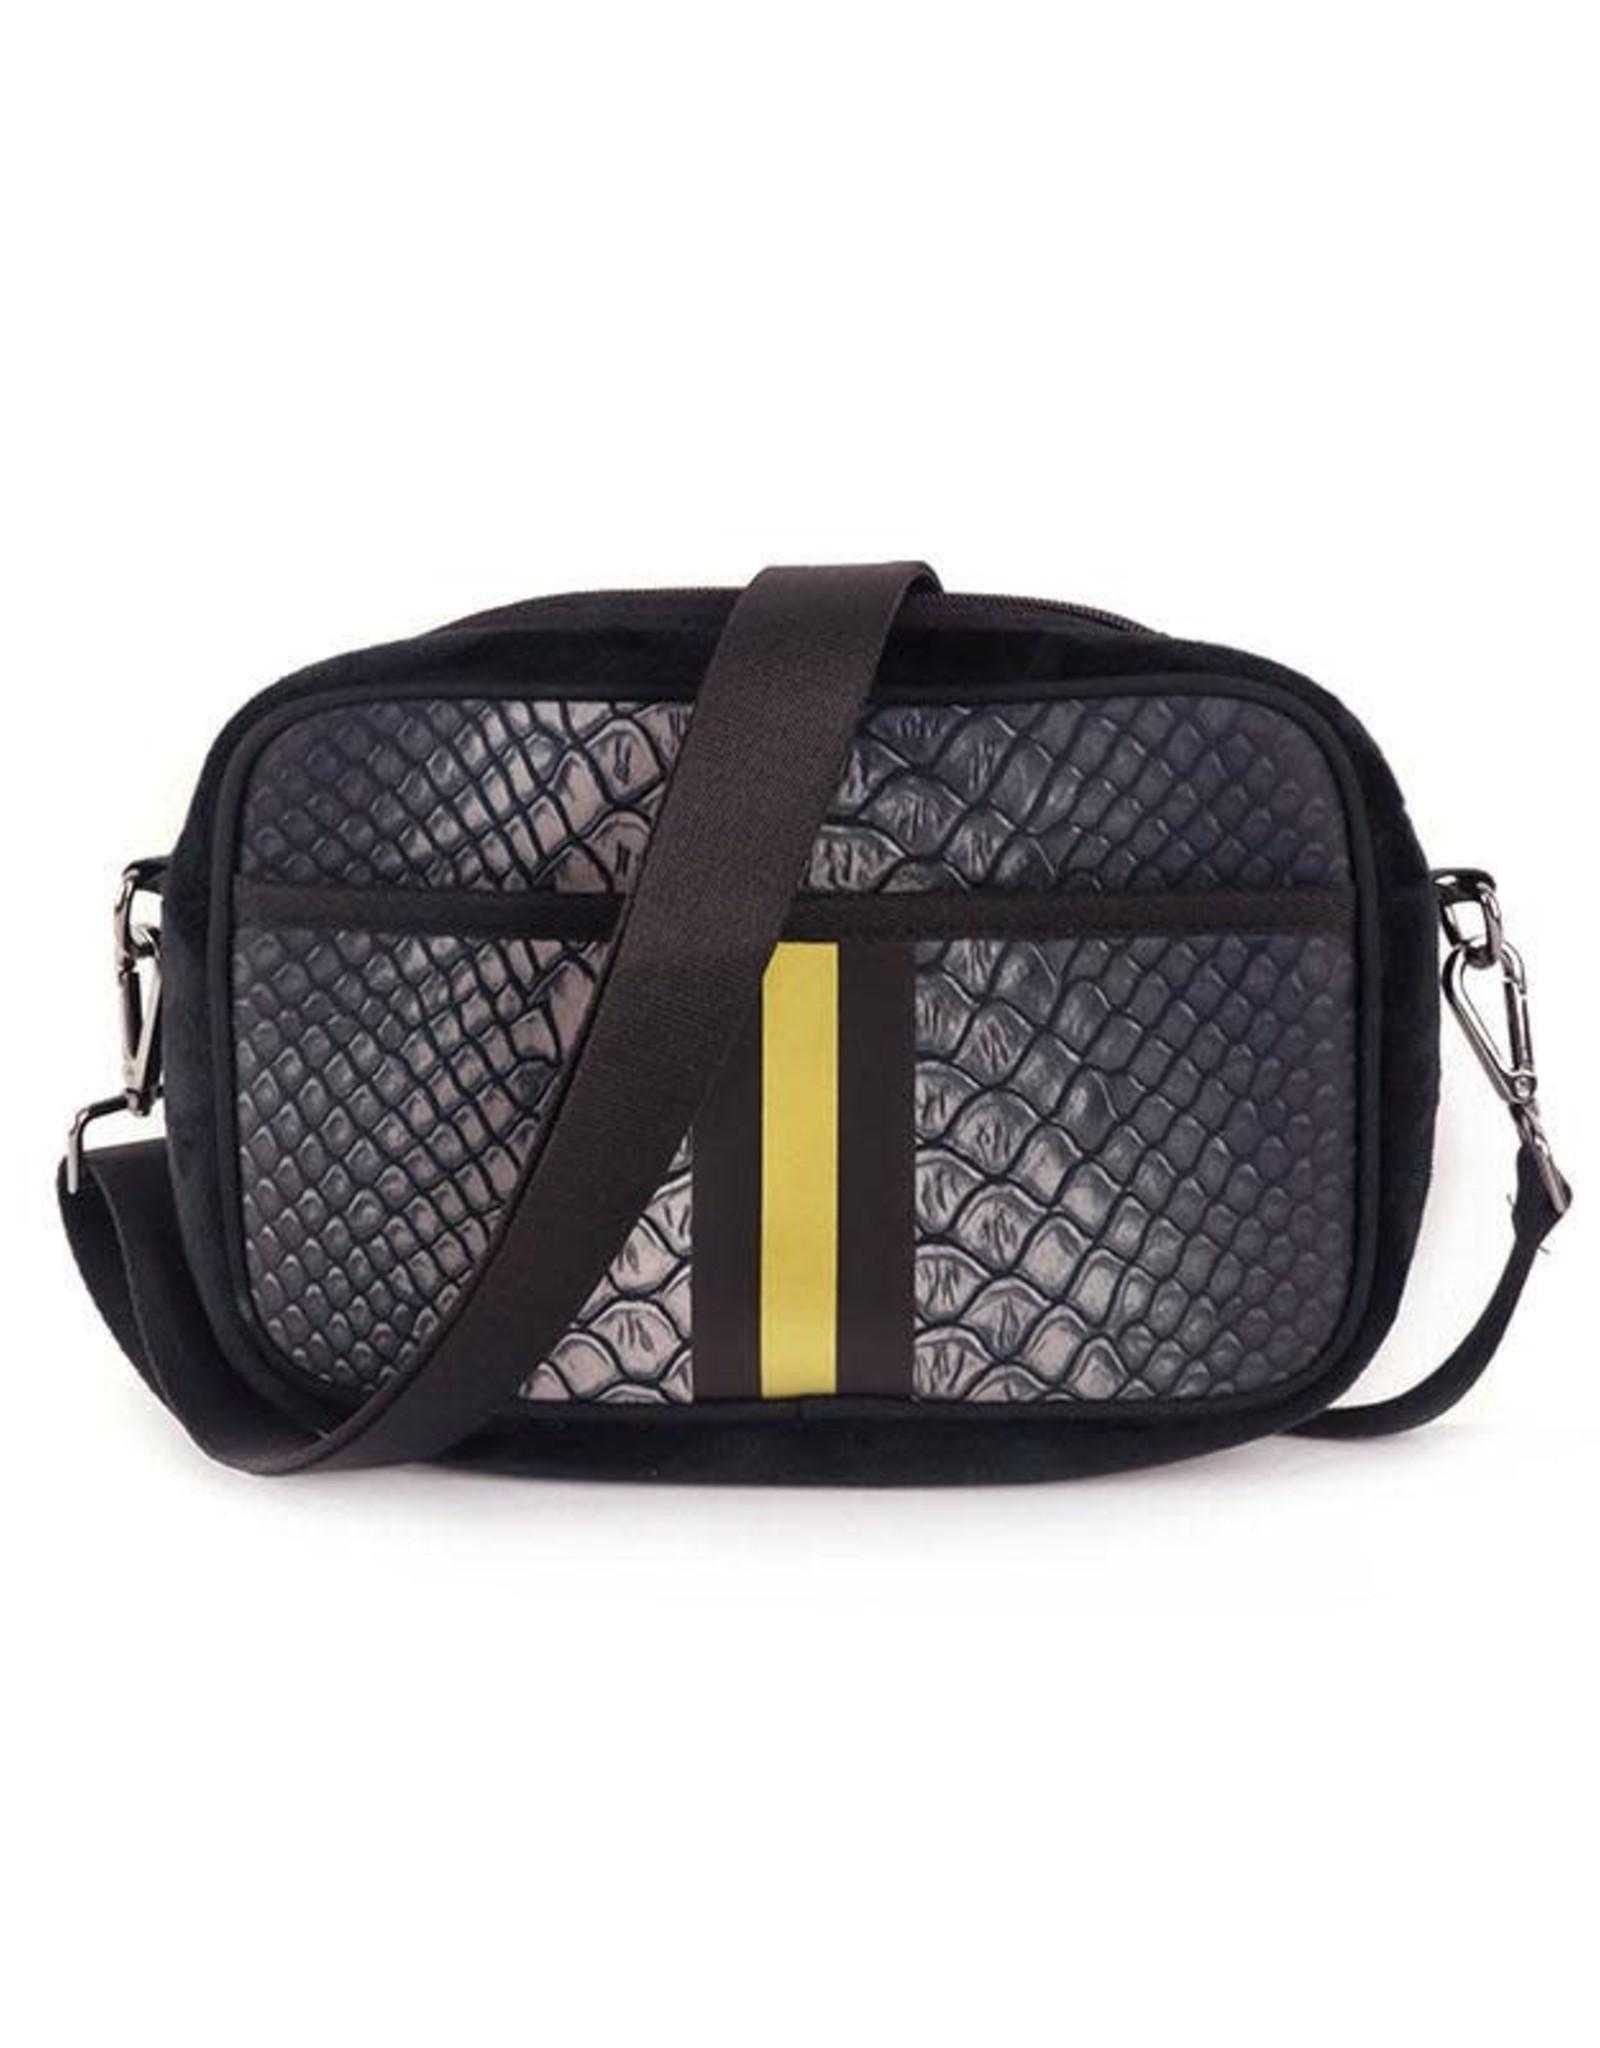 BC HANDBAGS Neoprene Crossbody Bag